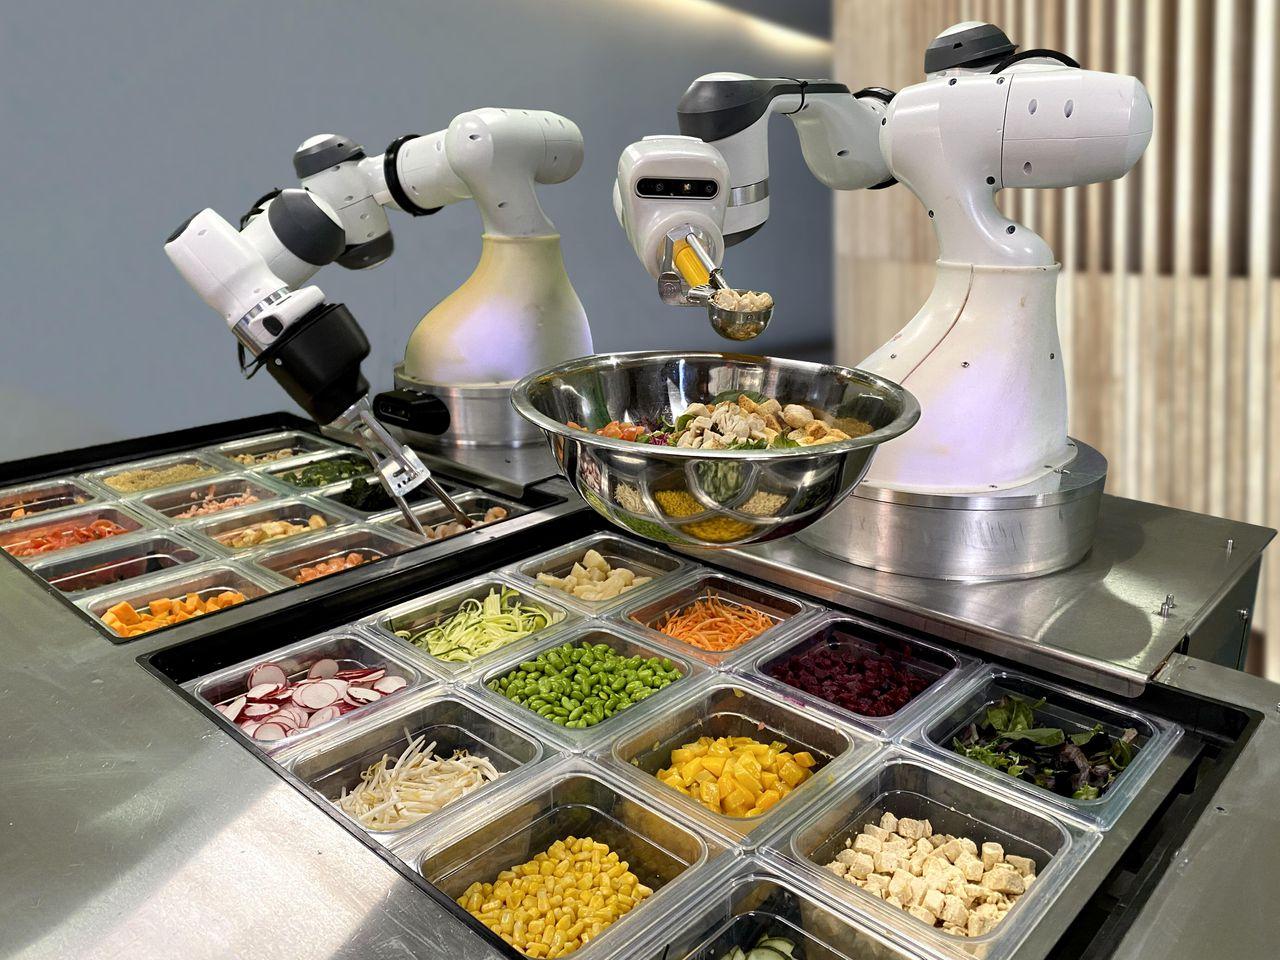 Dexai Robotics